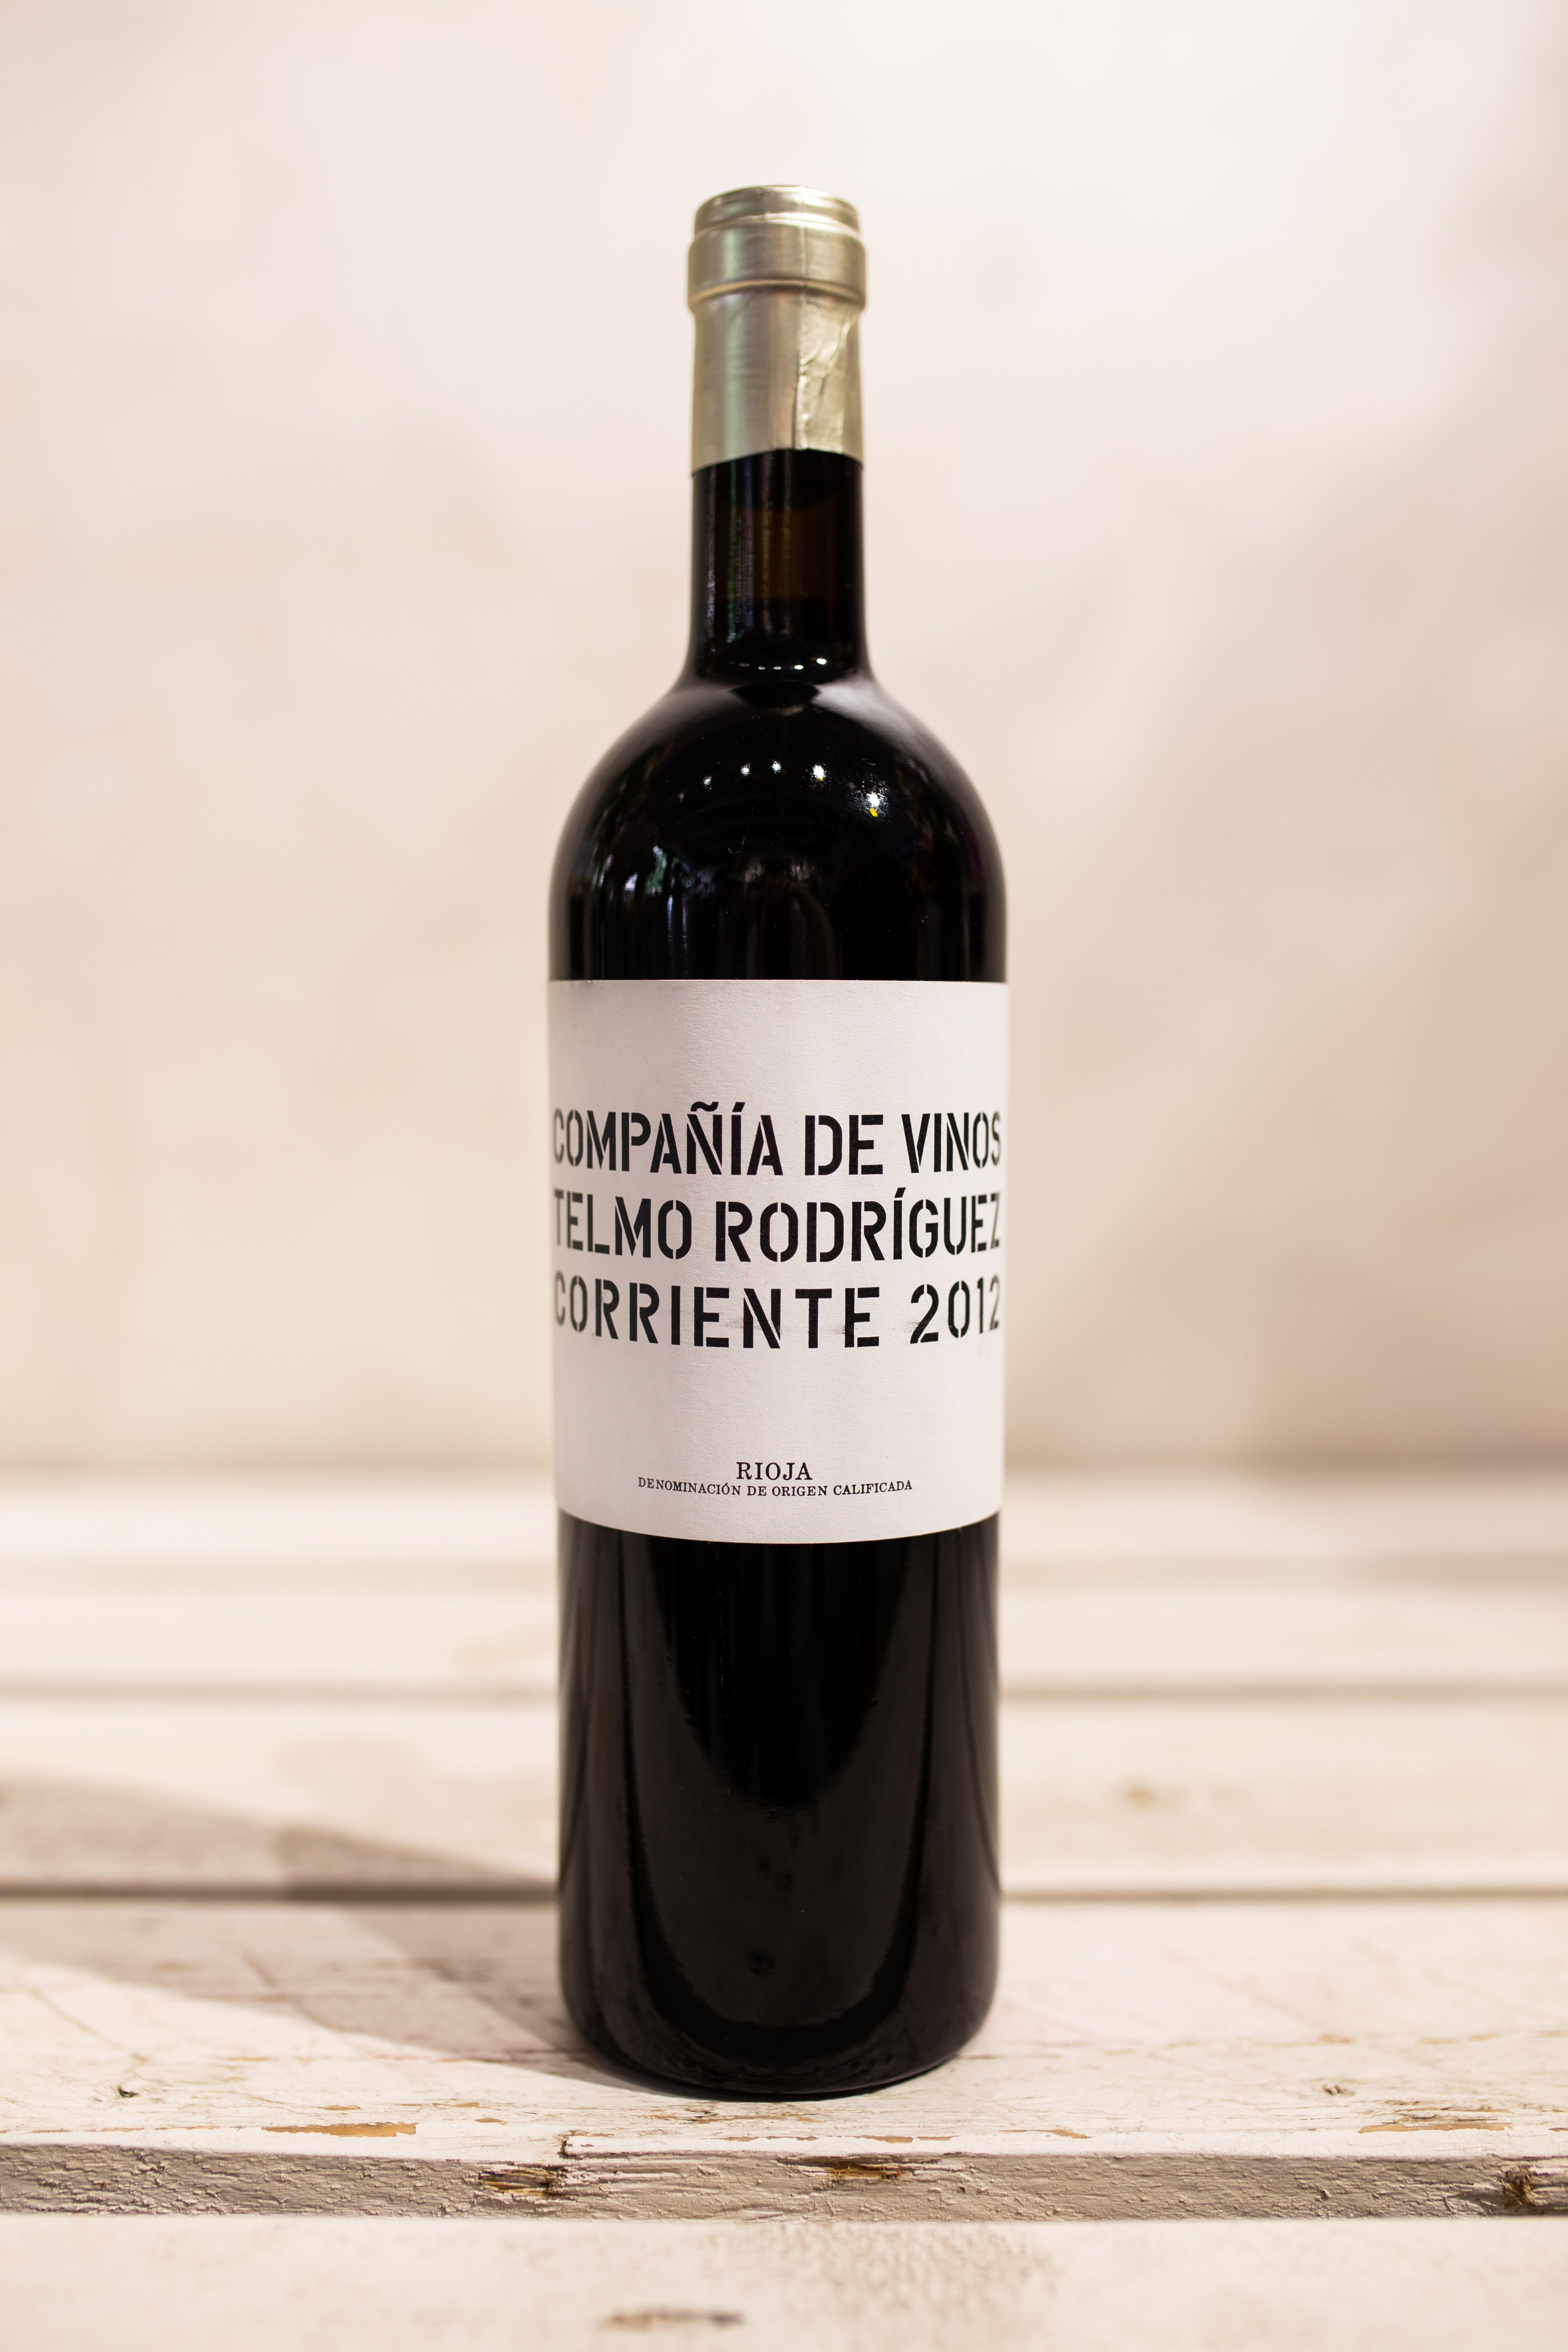 Rioja Telmo Rodriguez 2012